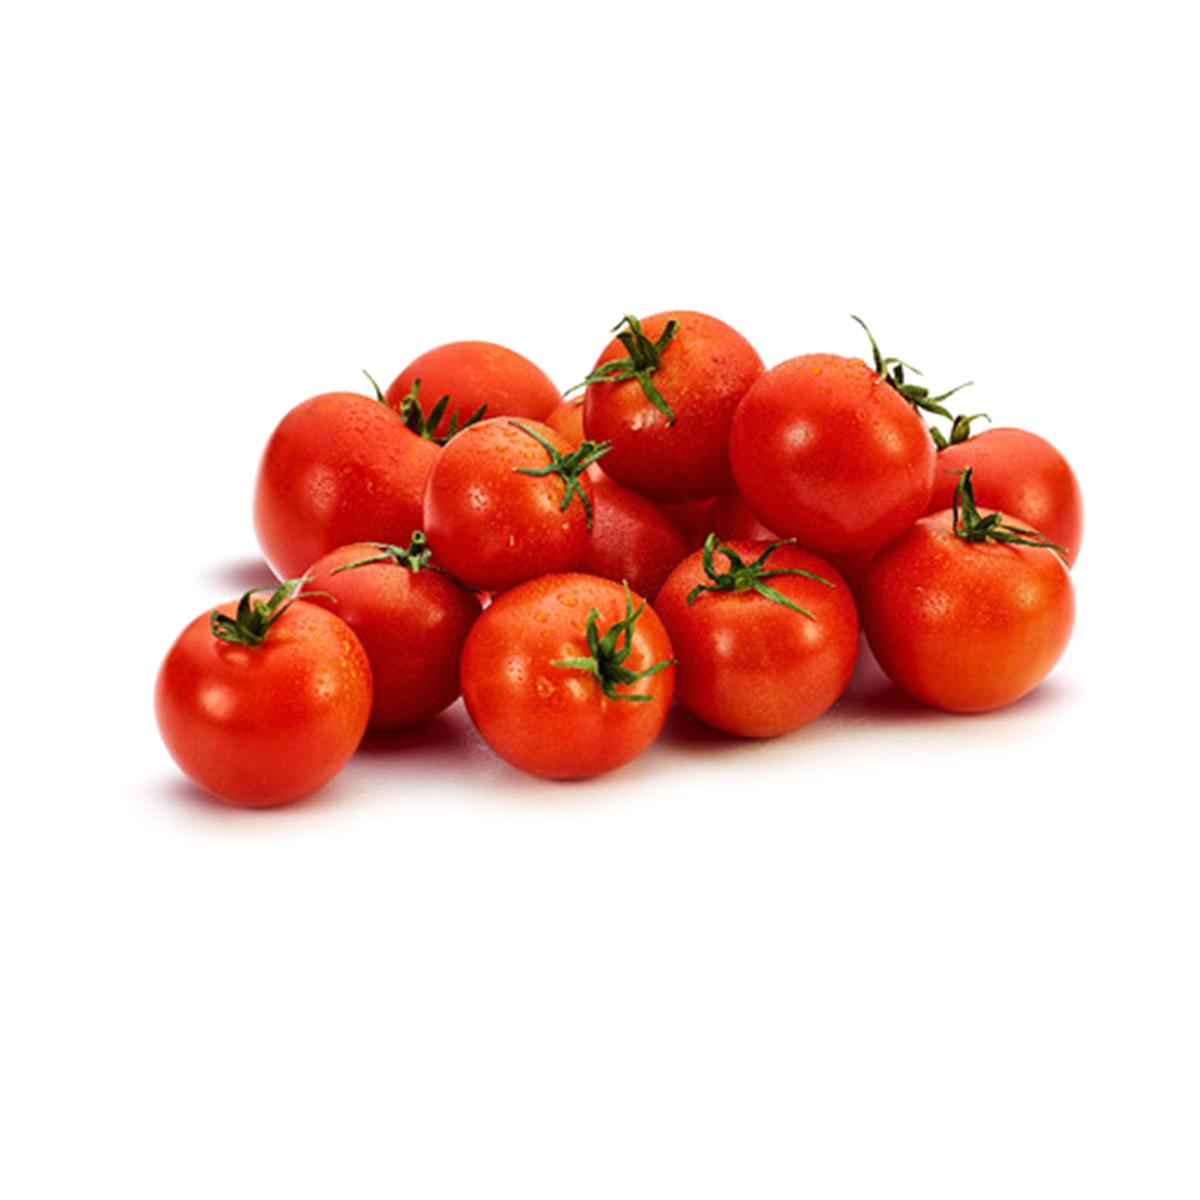 Market Gourmet - Campari Tomatoes